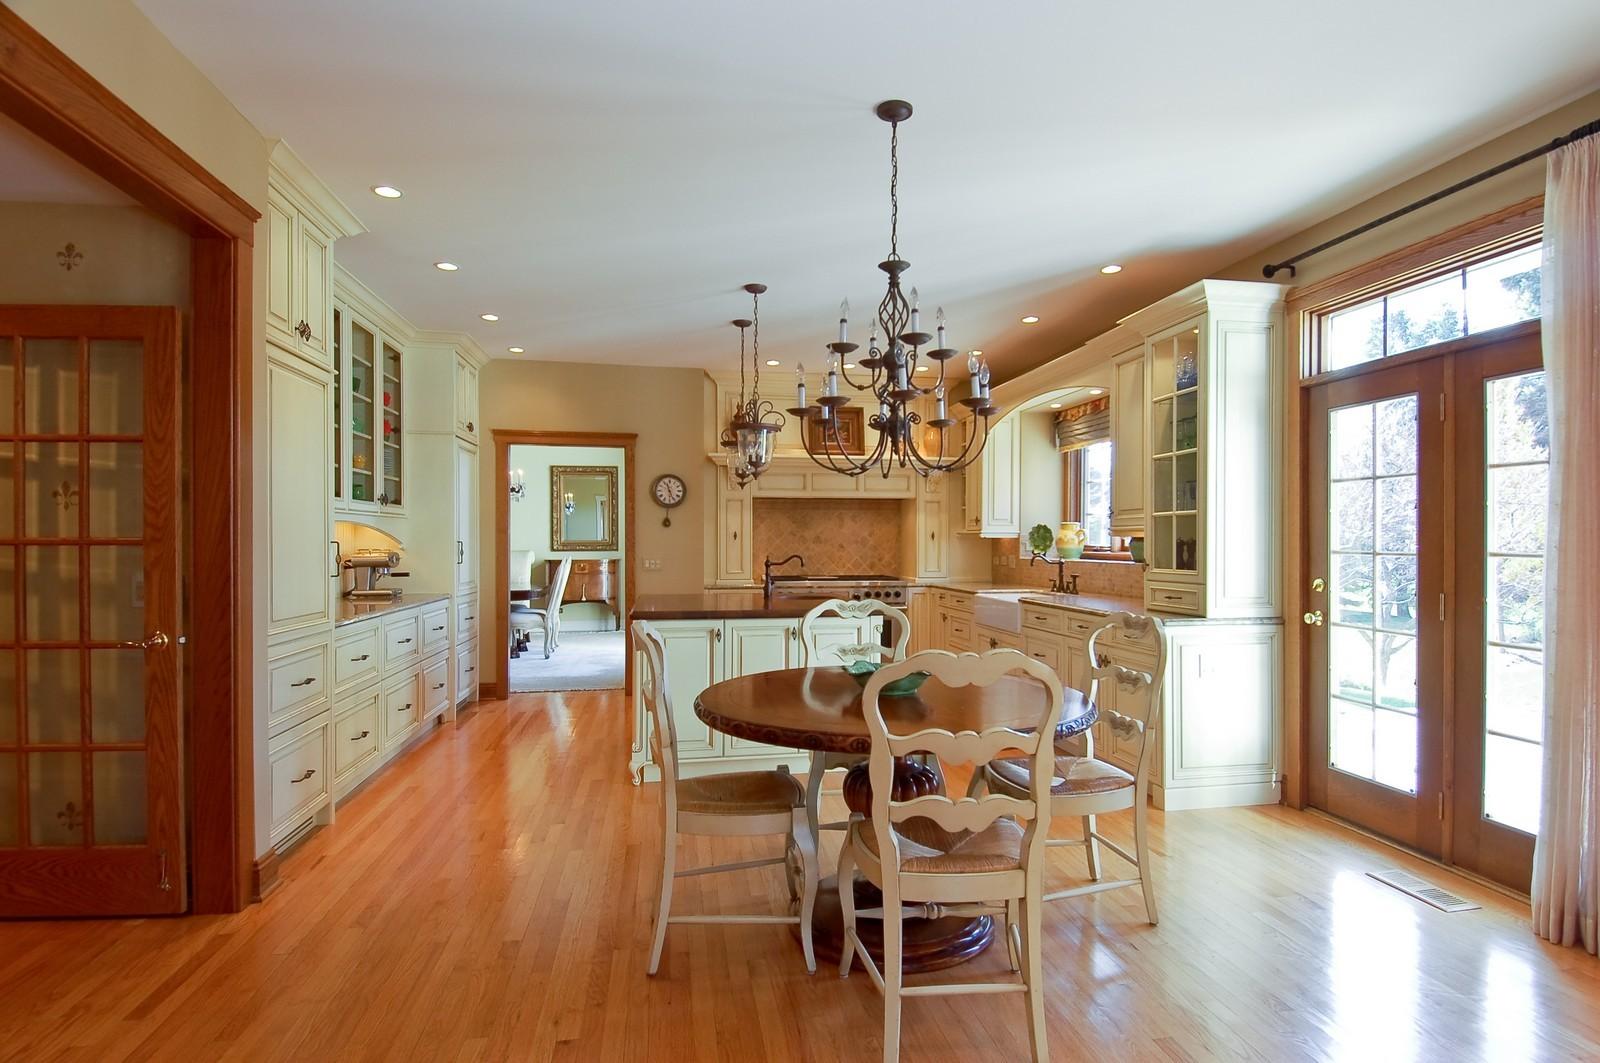 Real Estate Photography - 1492 Lloyd, Wheaton, IL, 60189 - Kitchen eating area